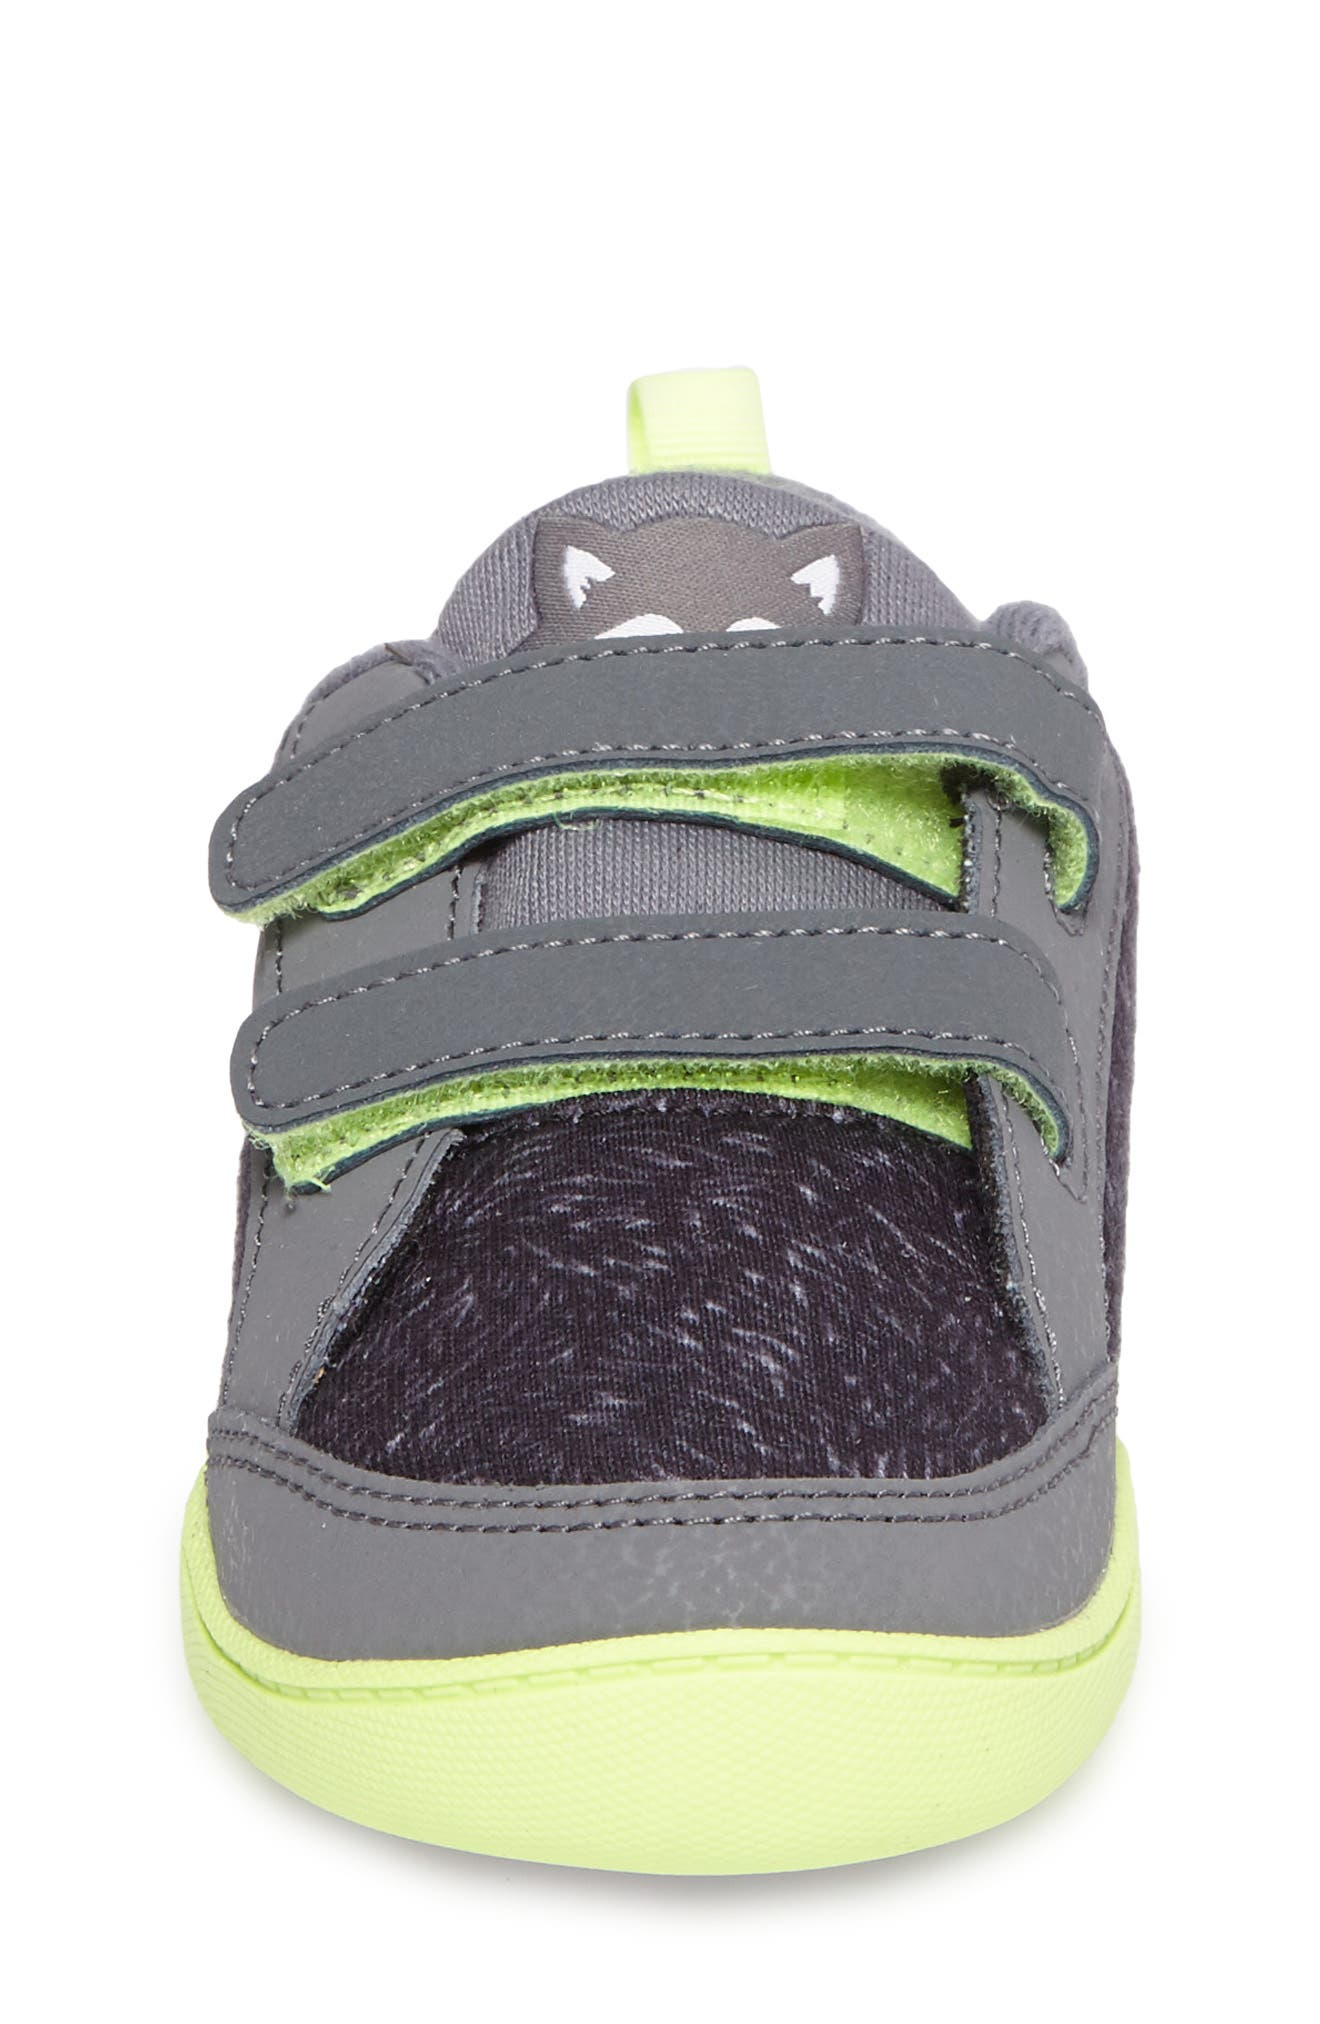 Alternate Image 4  - Reebok Ventureflex Critter Feet Sneaker (Baby, Walker & Toddler)